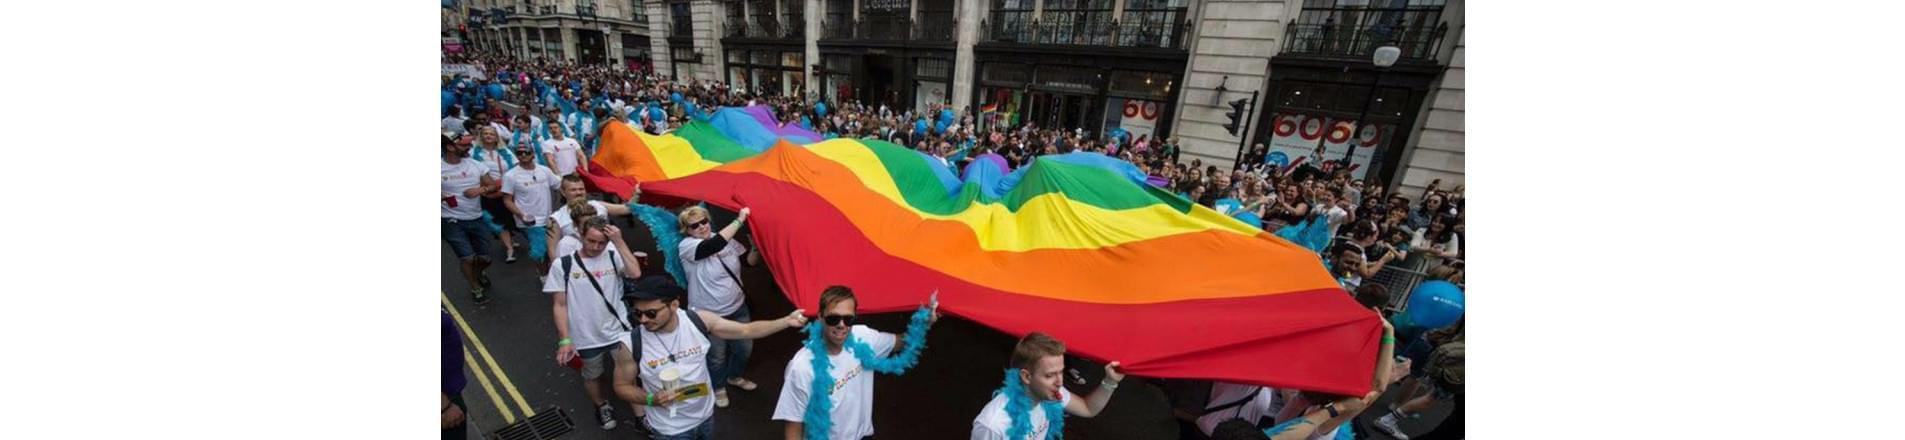 Barclays was the 2017 headline sponsor of London Pride